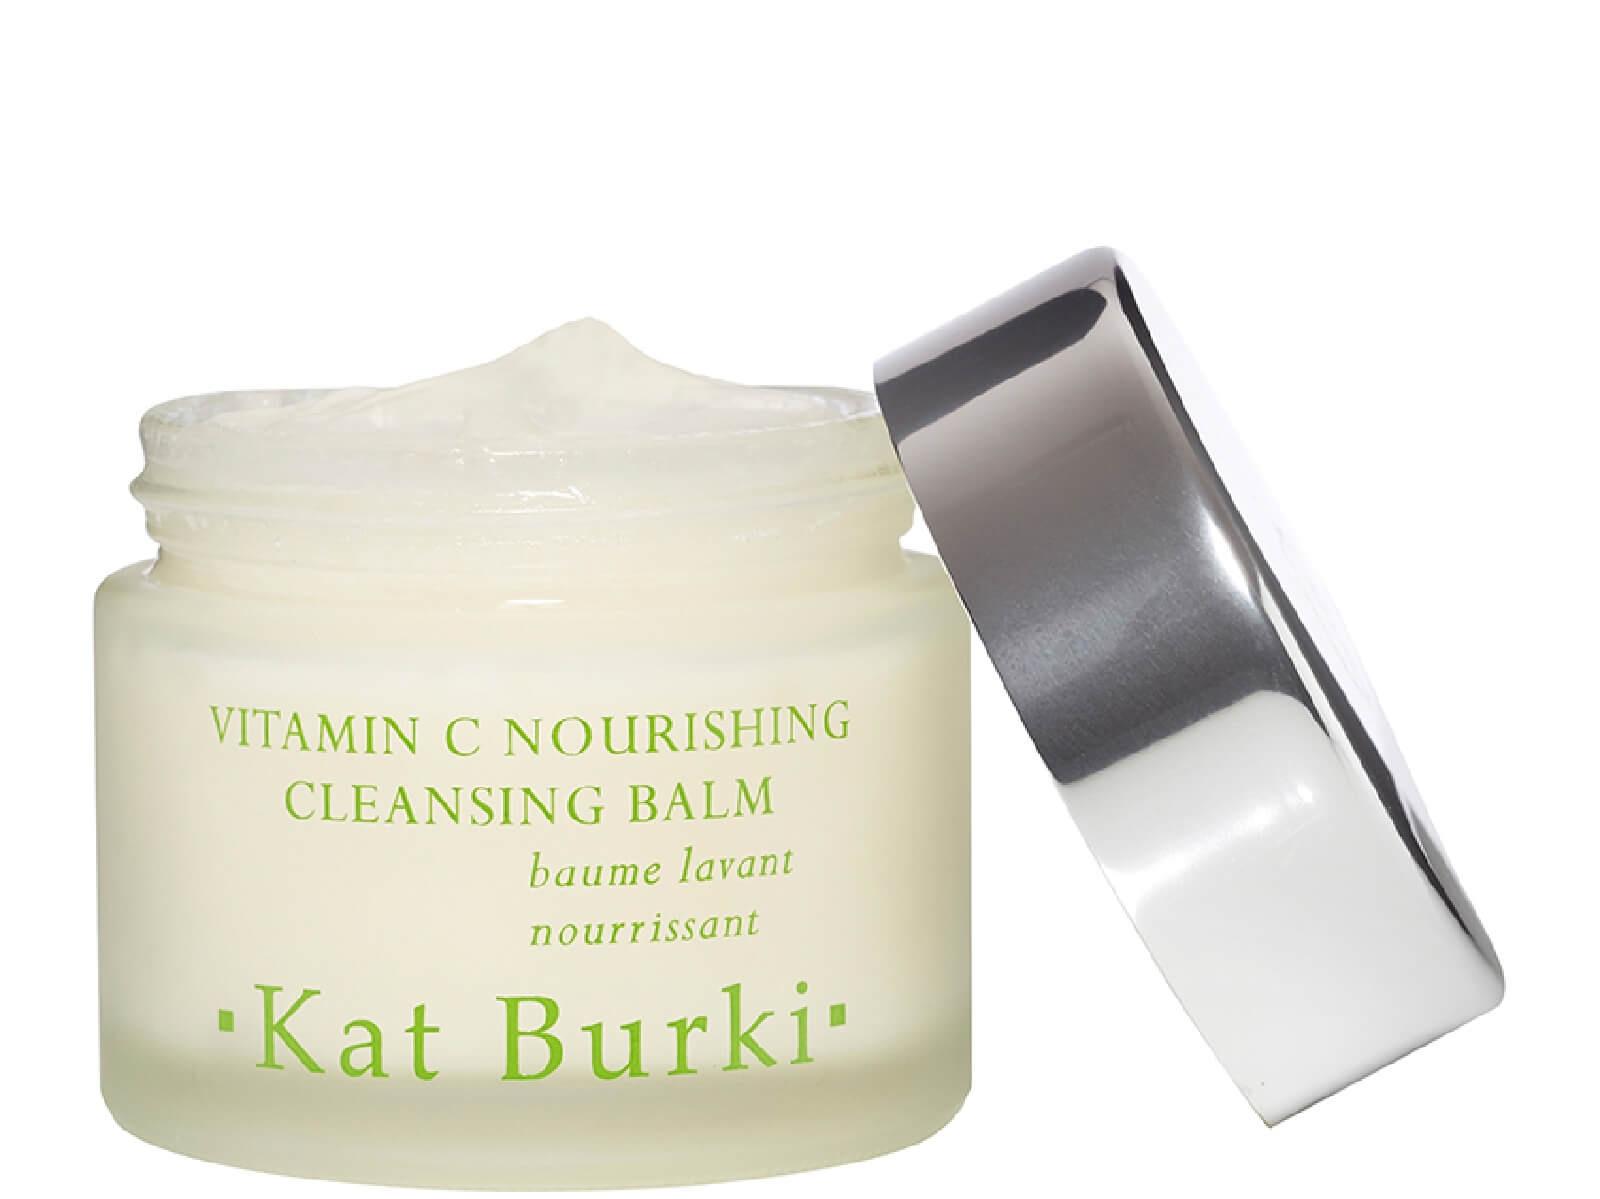 KATBURKI - Vitamin C Nourishing Cleaning Balm £56